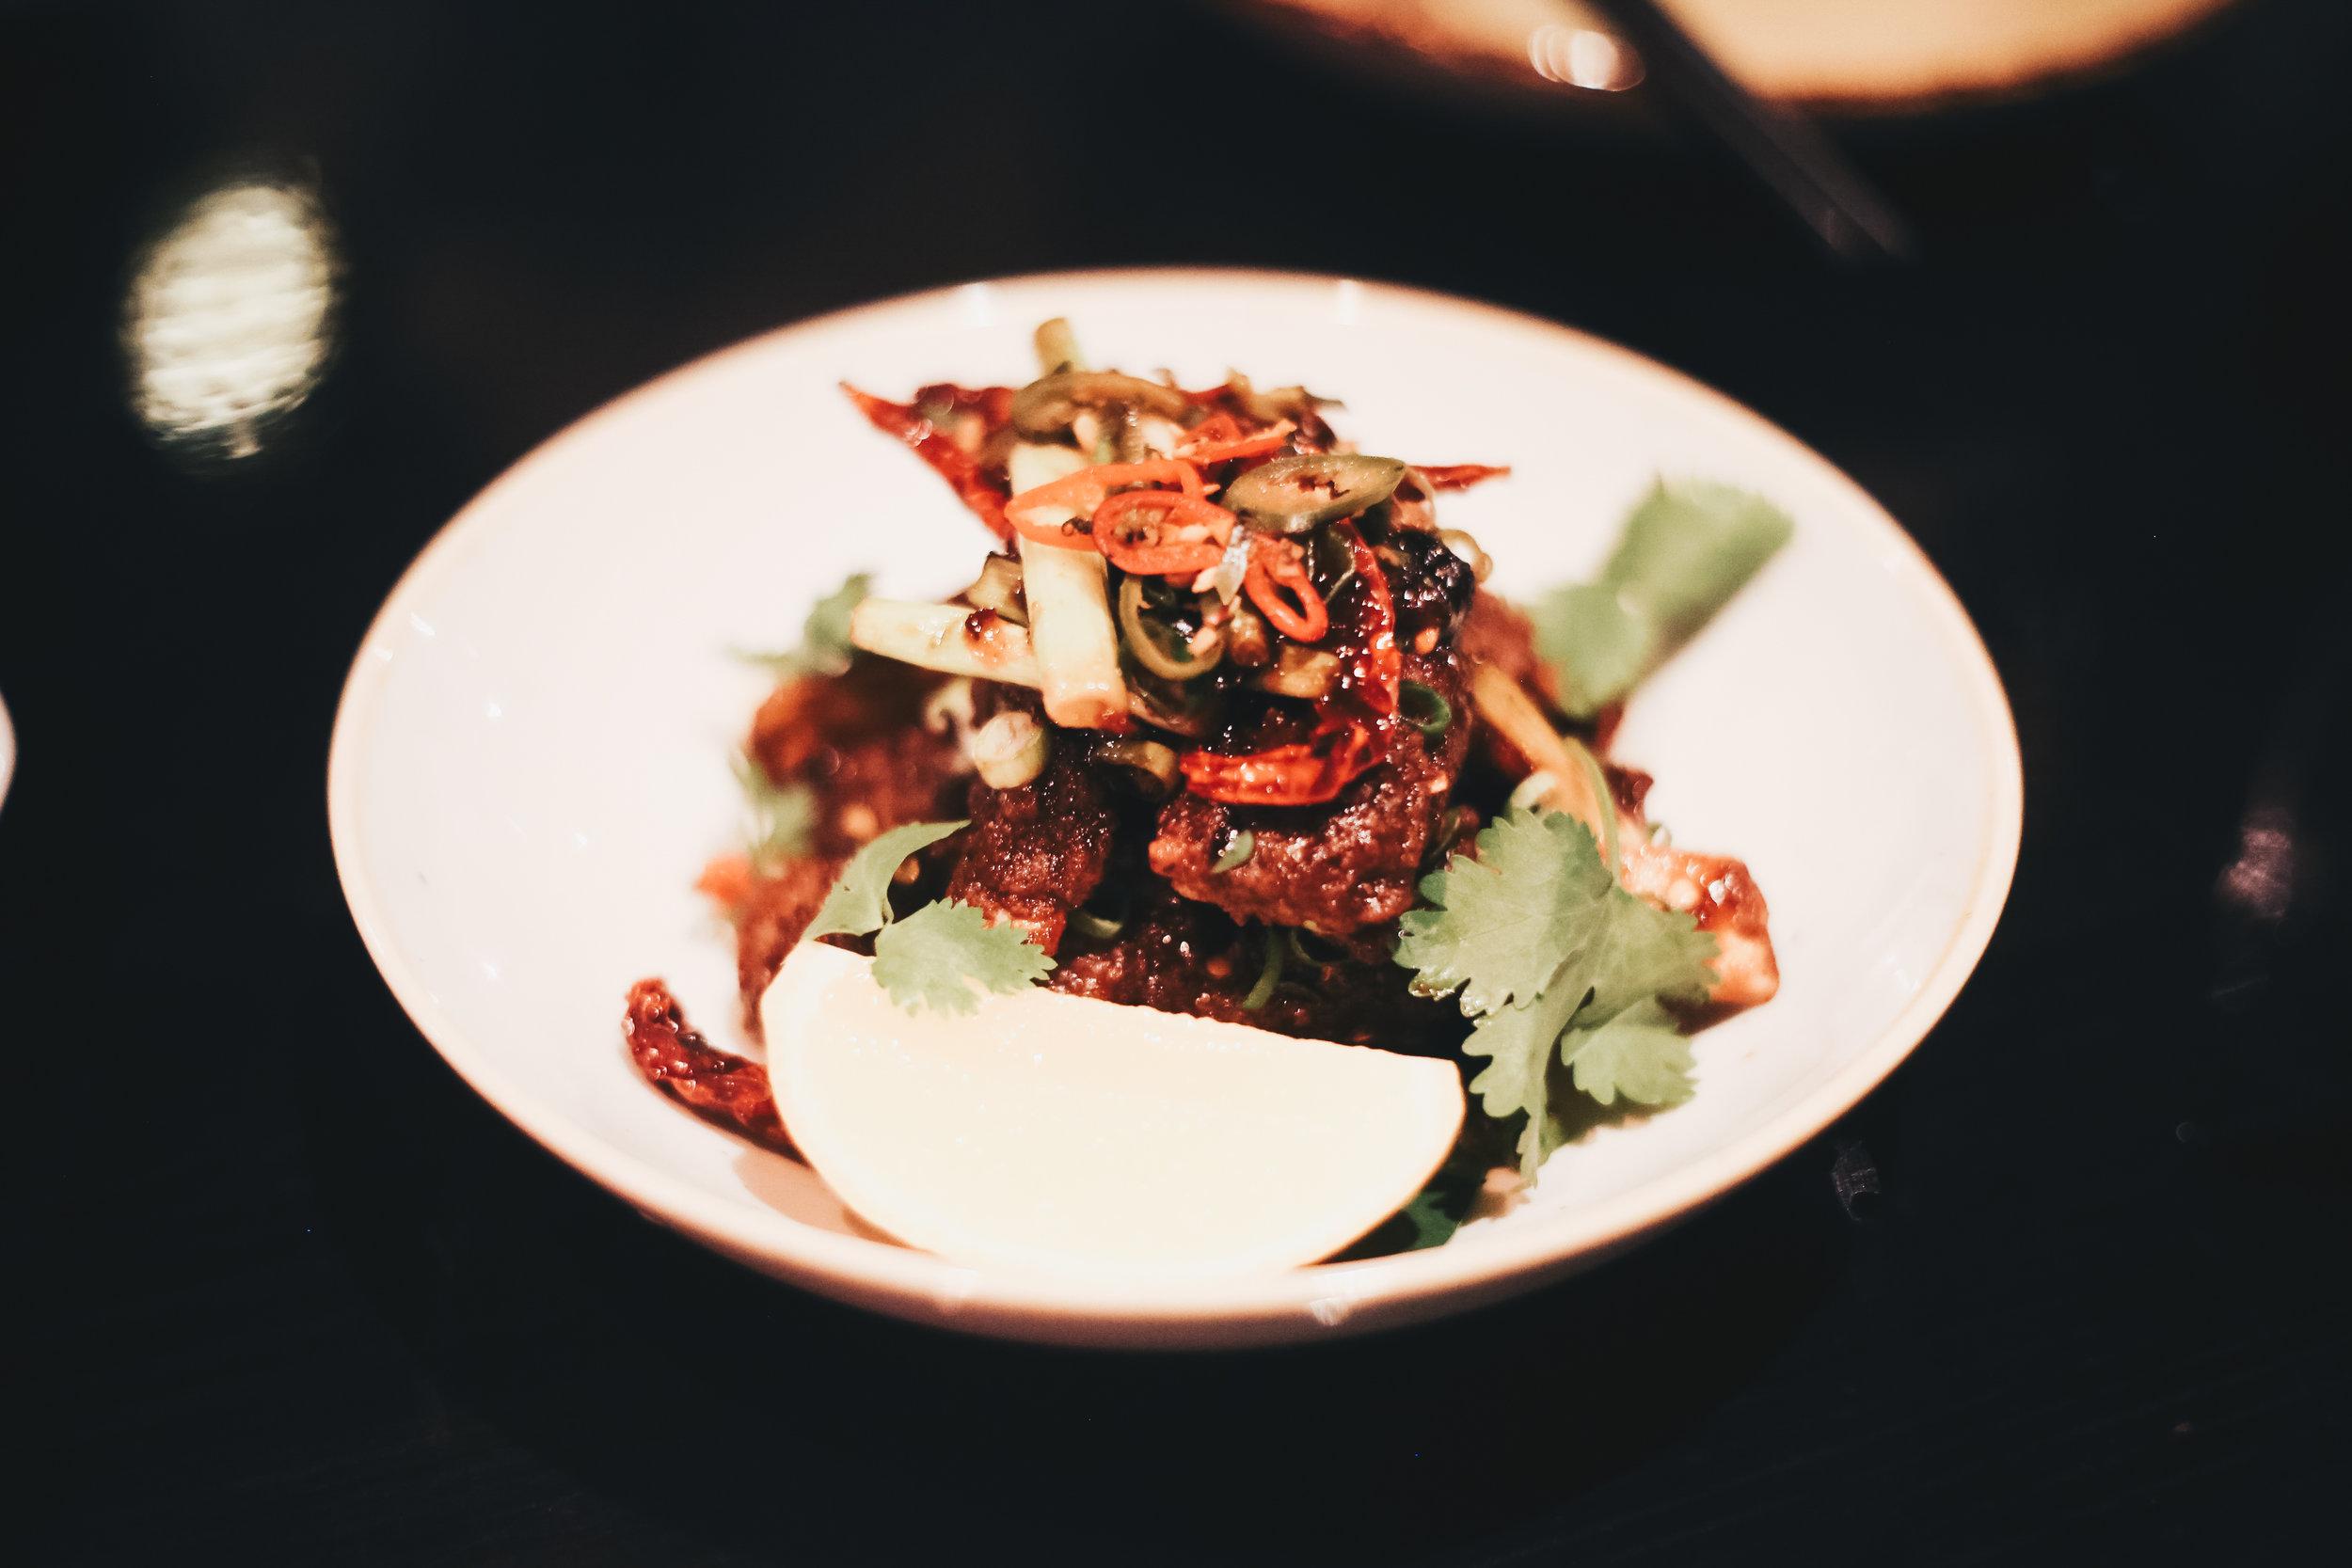 Wok fried lamb ribs with black bean & shallot